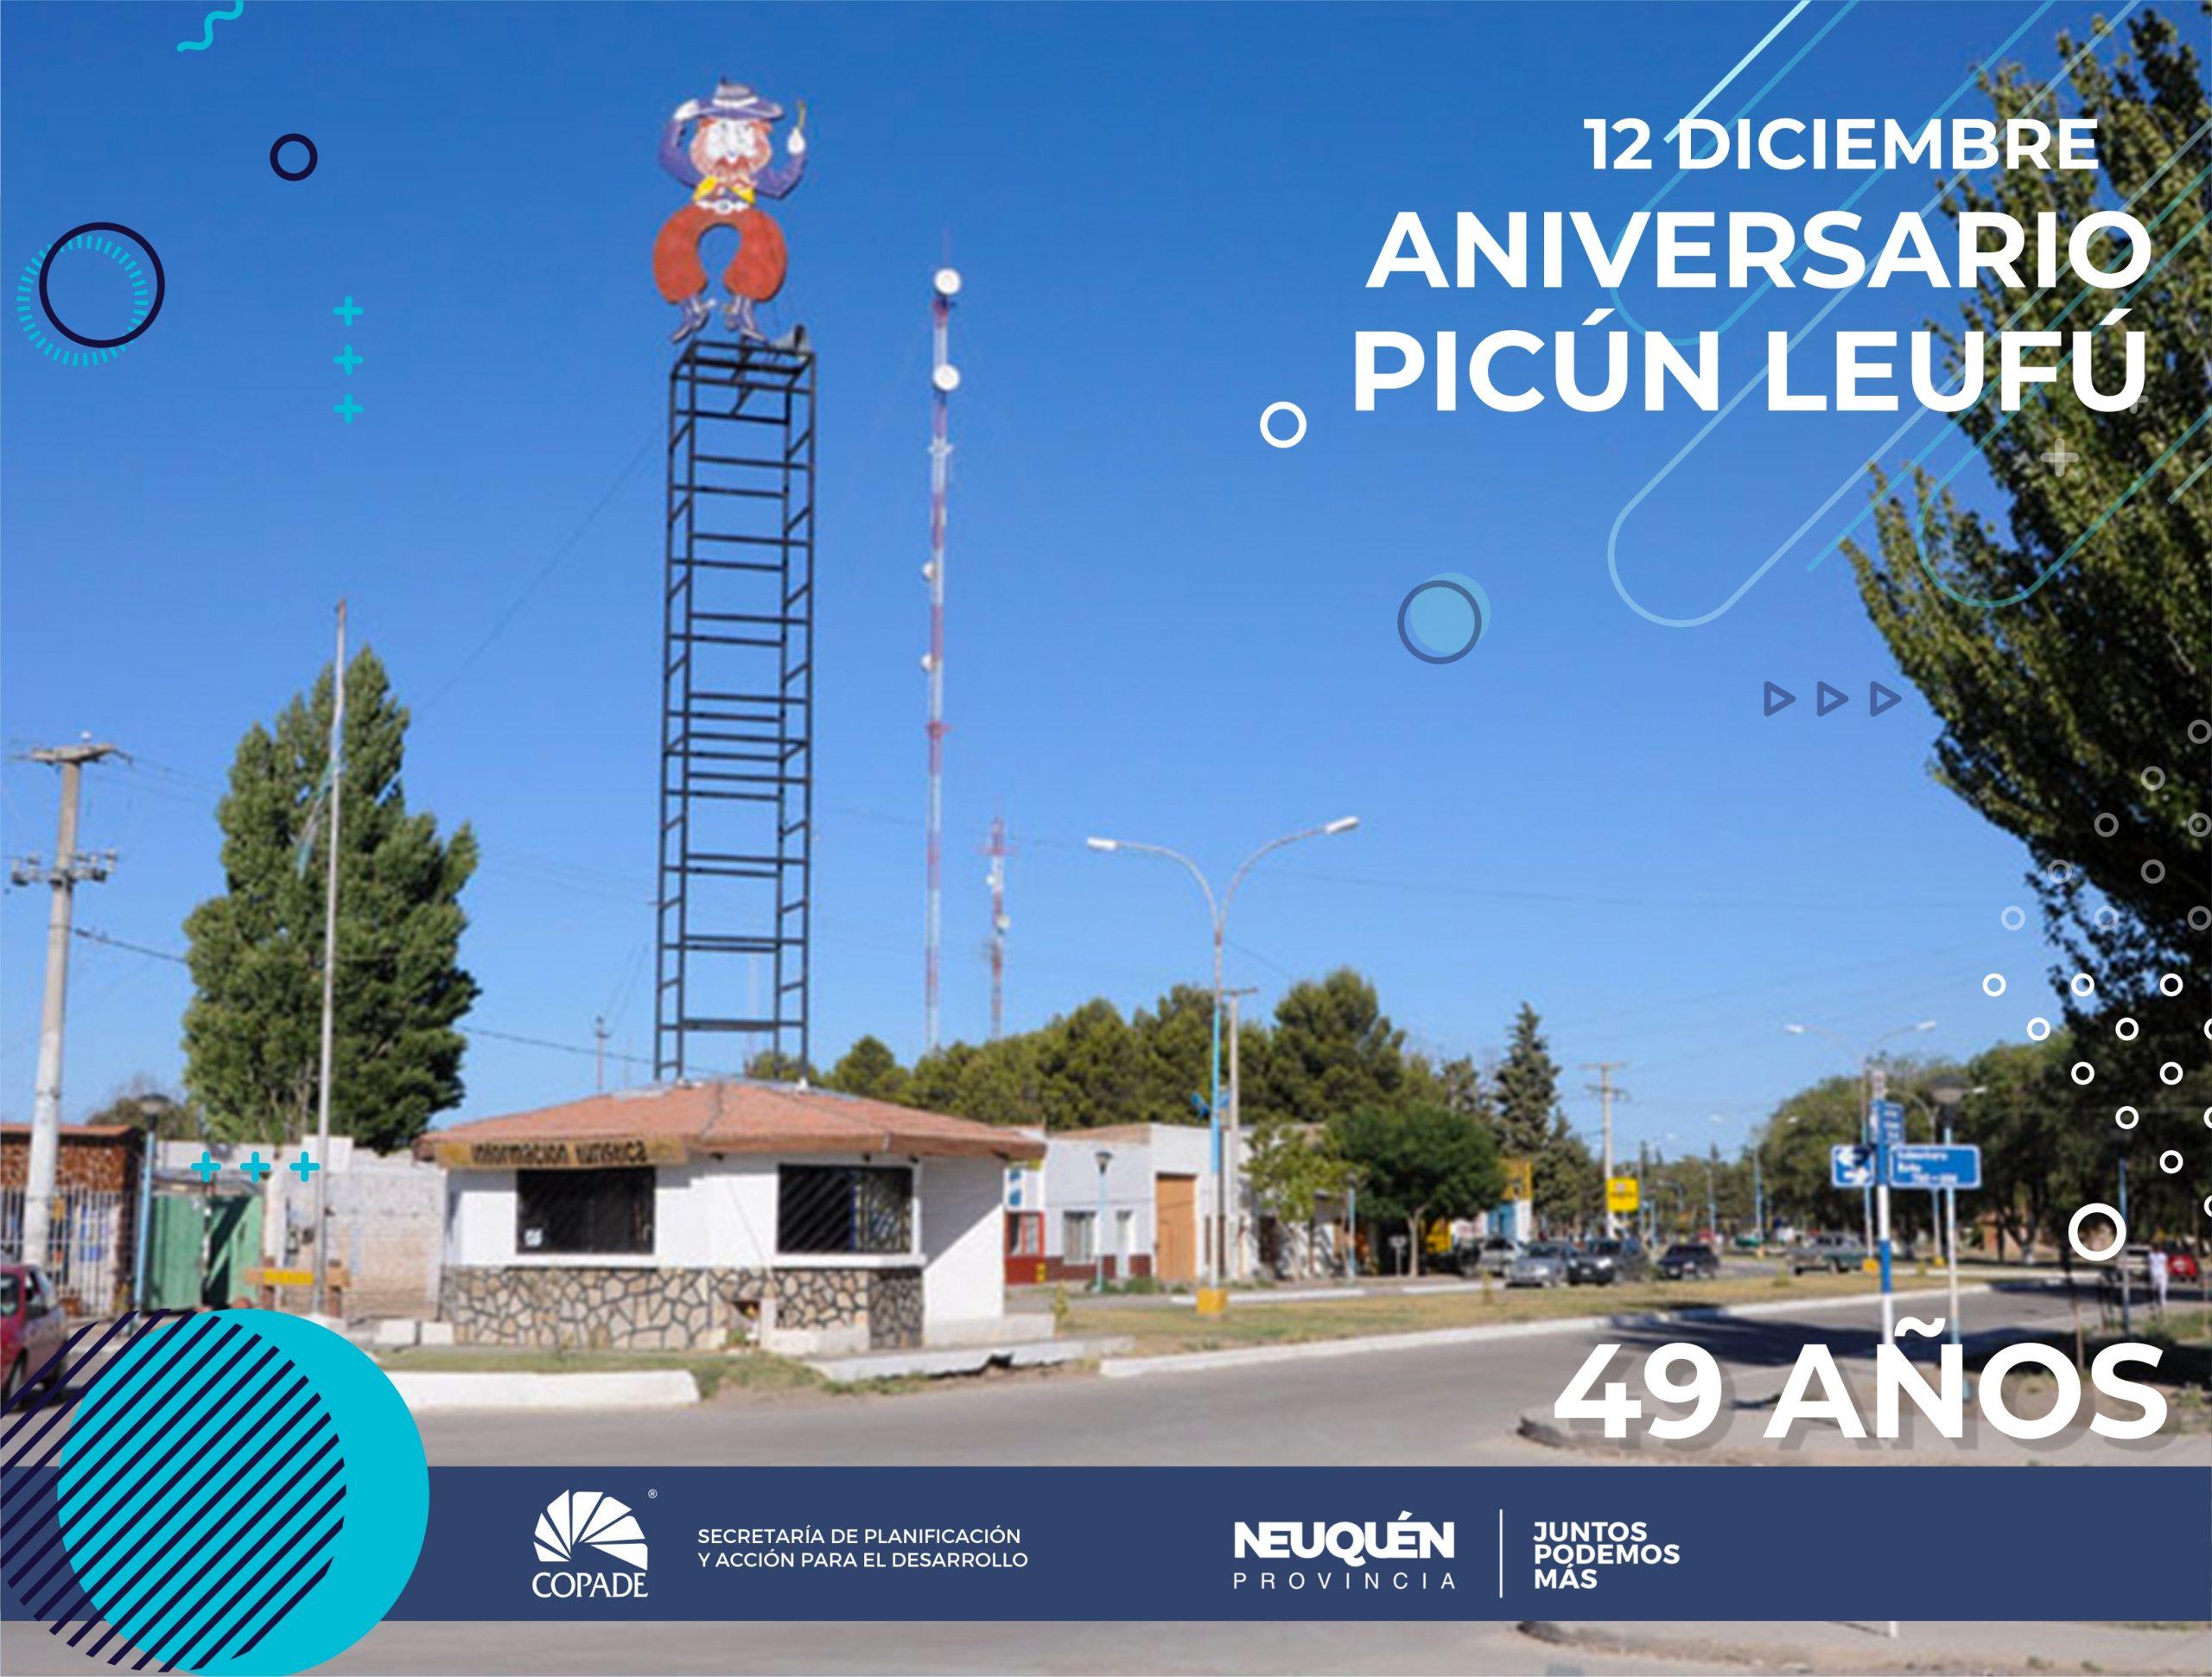 12 de diciembre | Aniversario de Picún Leufú